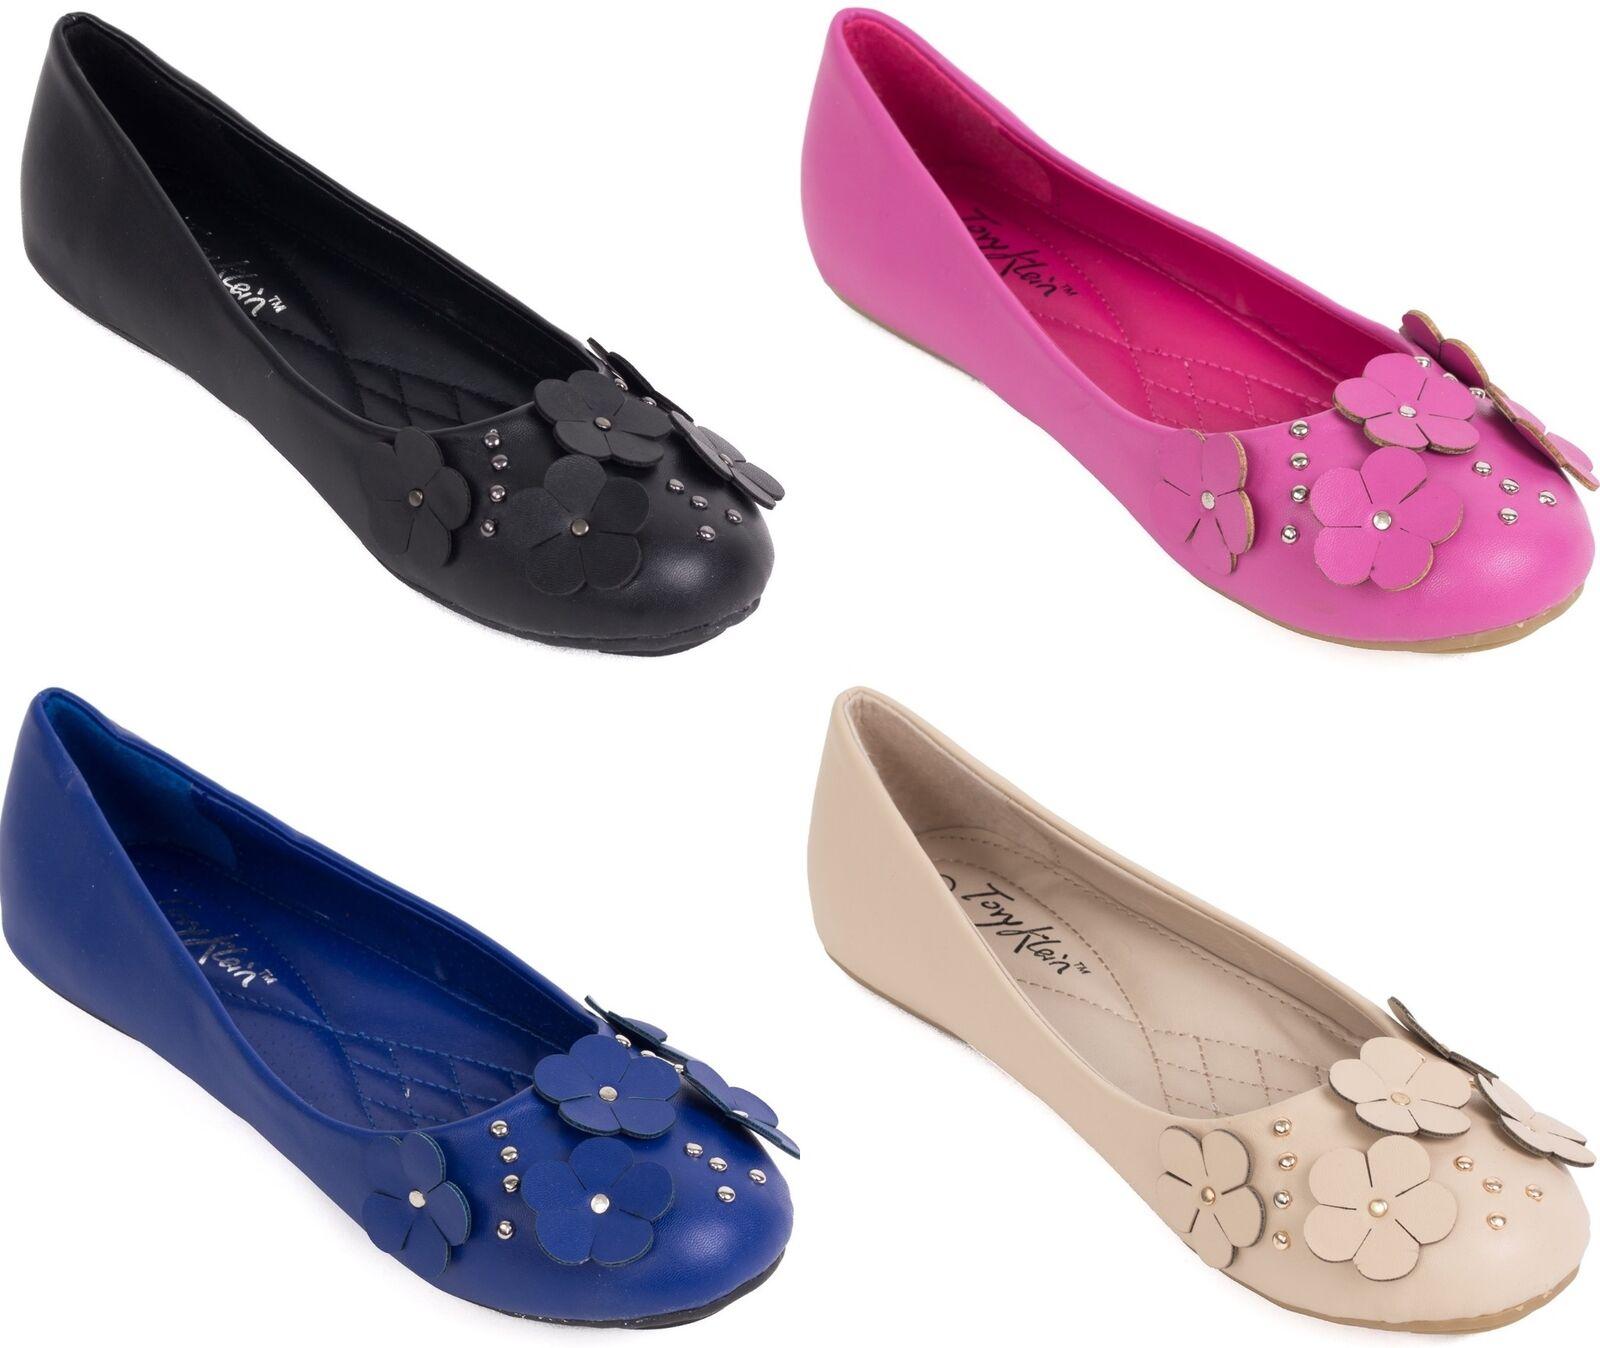 NEW * Women's Ballet Flats w/ Flowers Buckle, Ballerina Classic Slip On Shoes